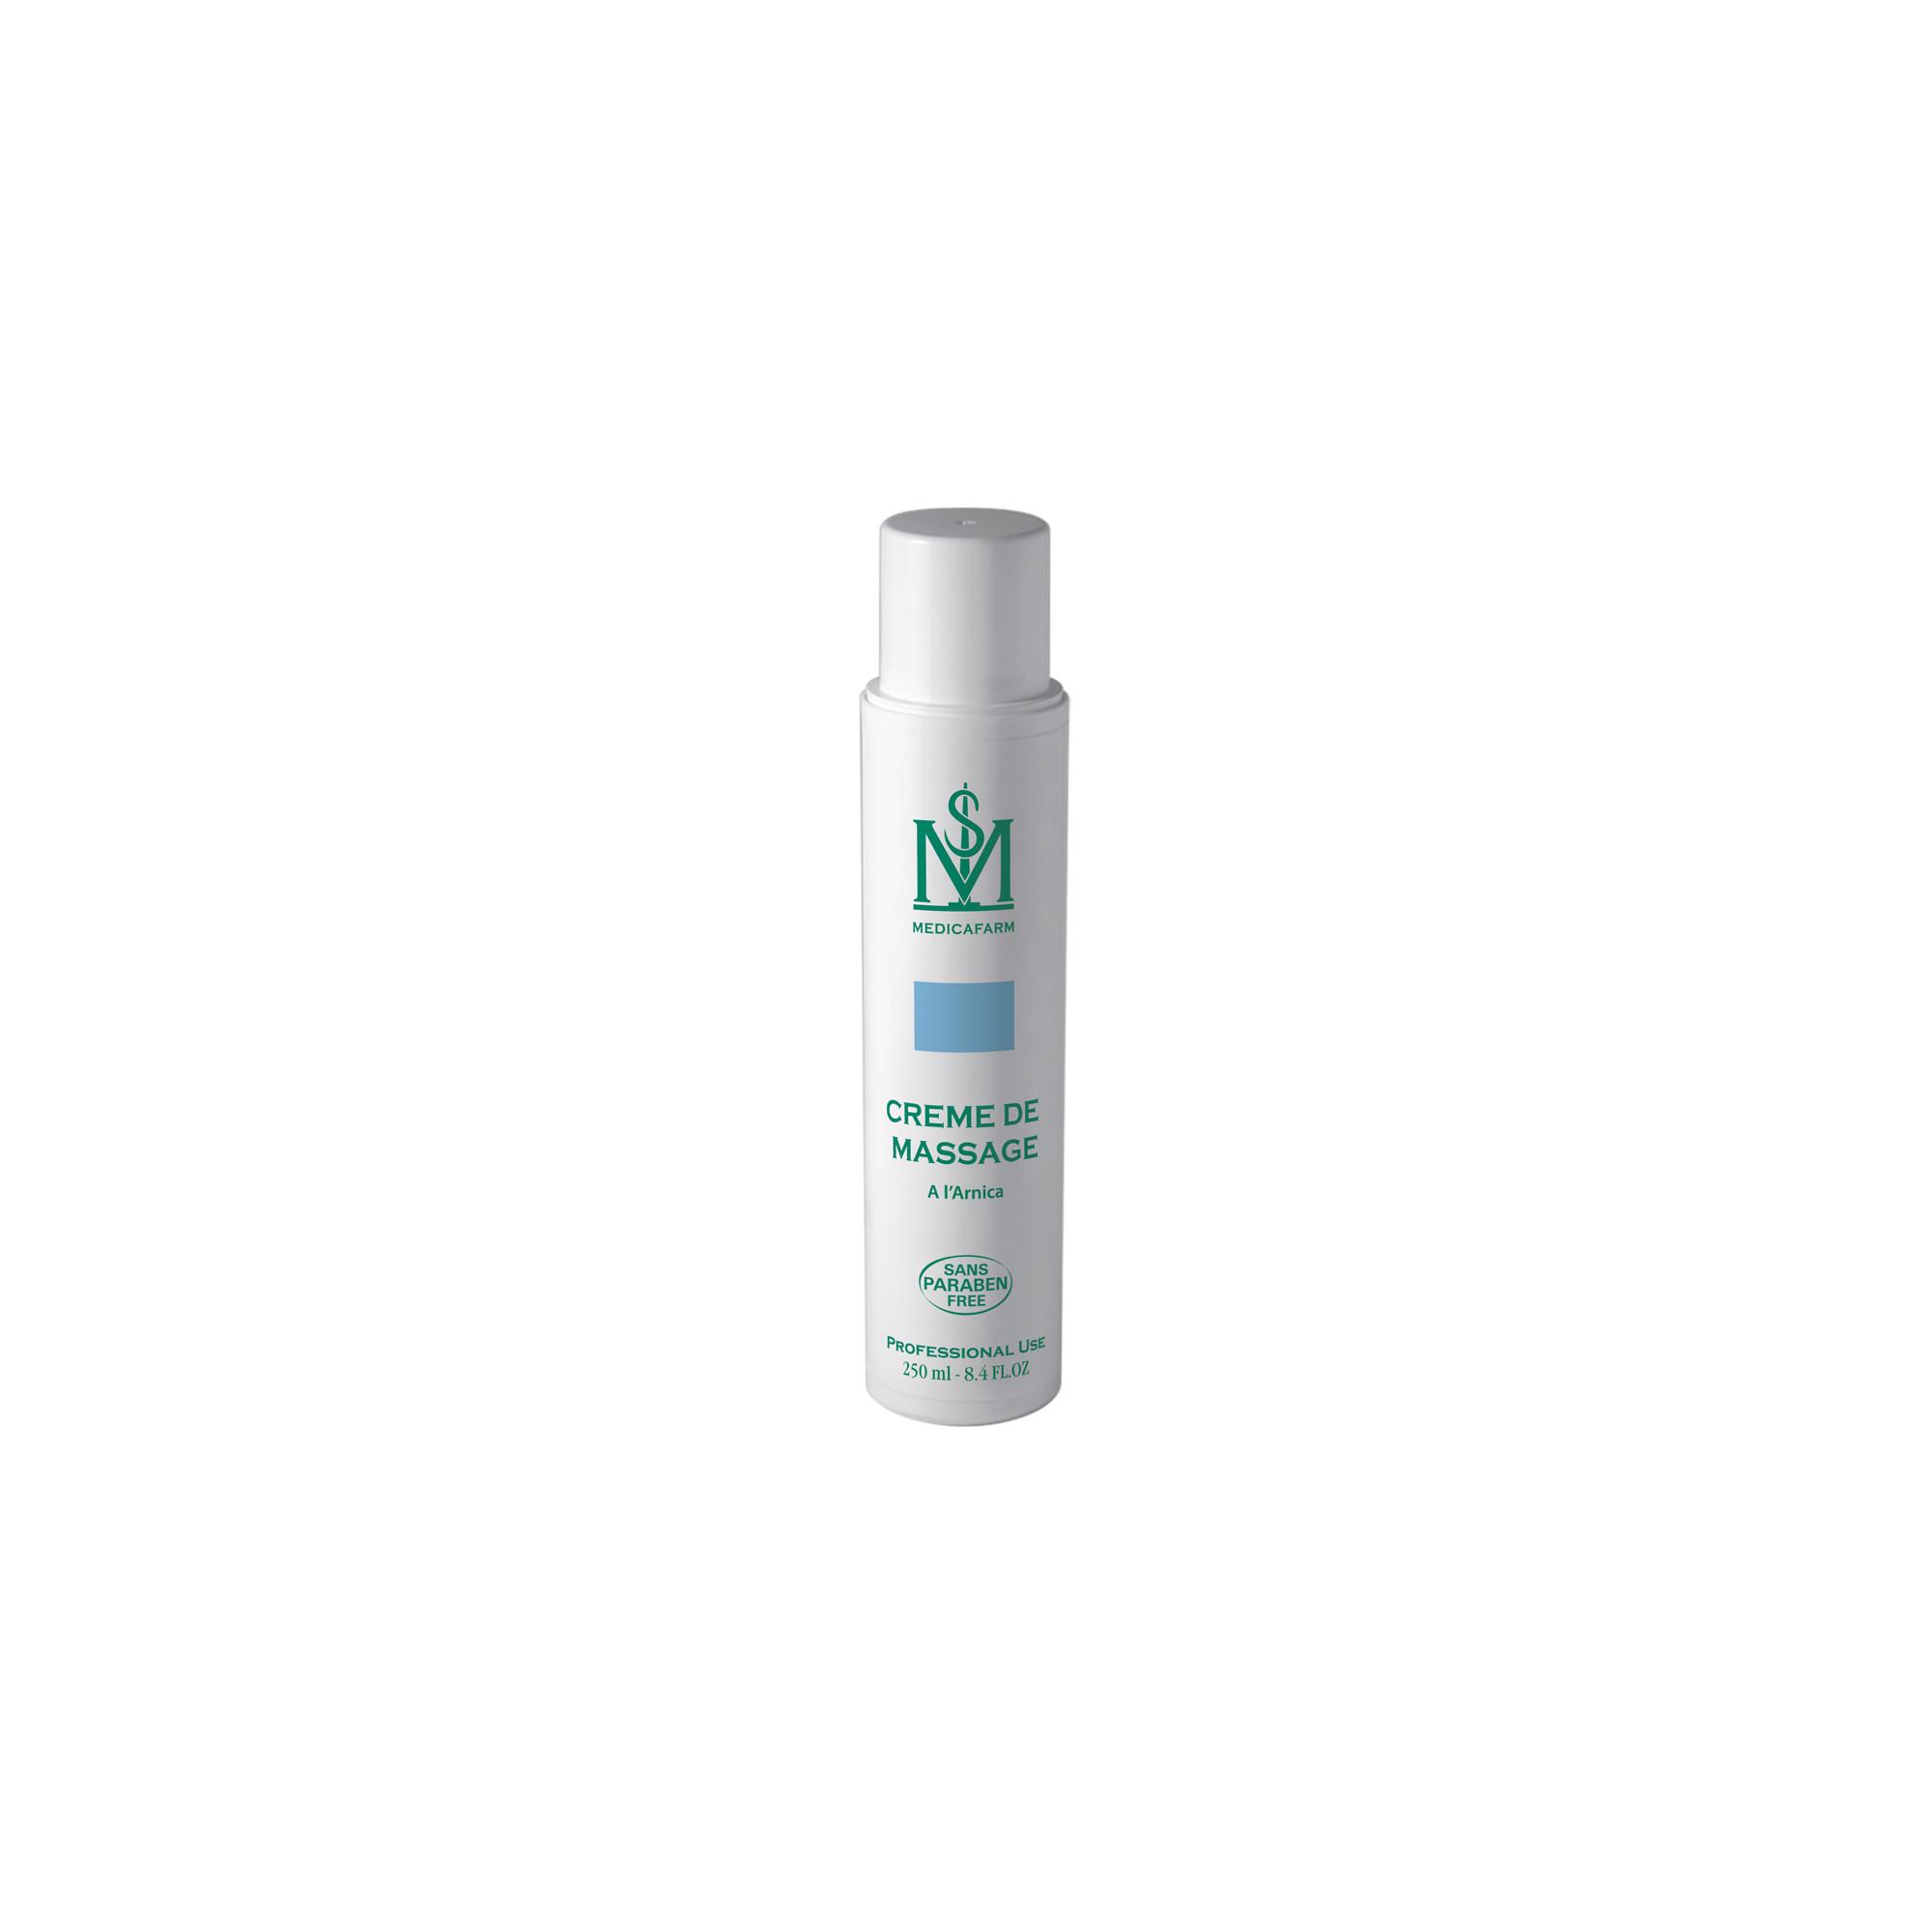 Crème de massage à l'arnica - Flacon Airless 250 ml